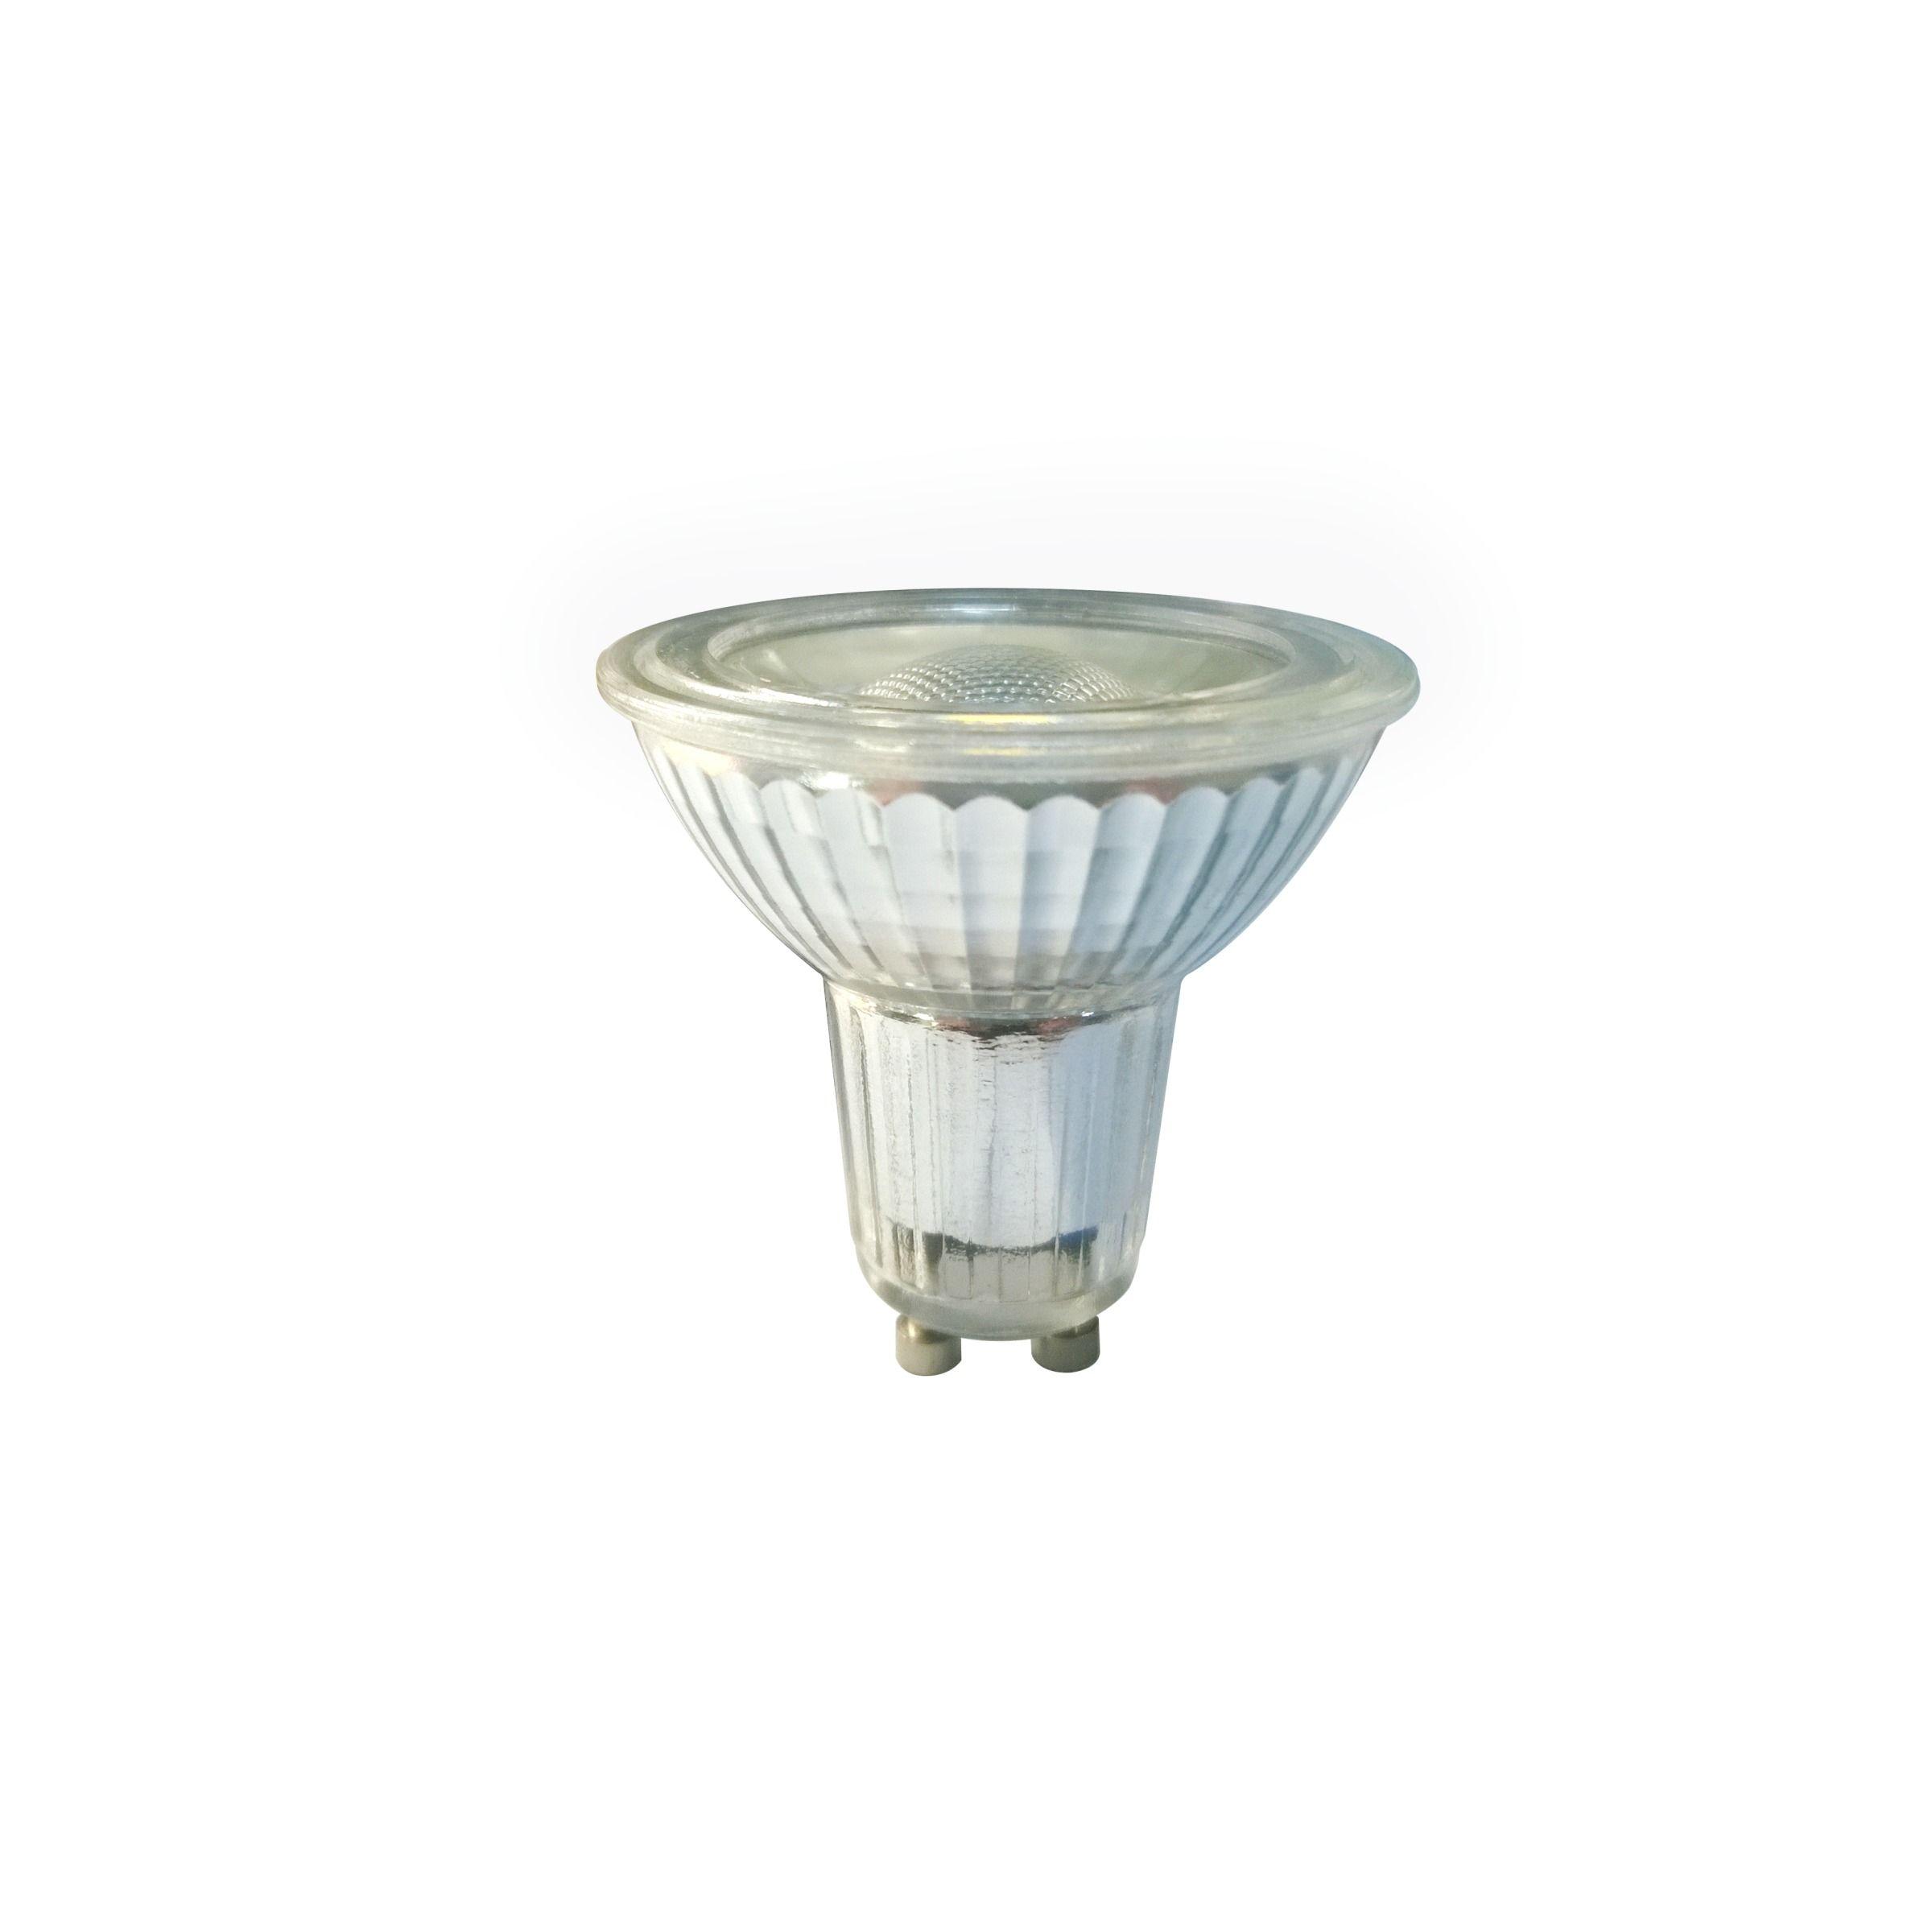 Handson Led Spot Gu10 3w 35w 250lm Warm Wit Led Lamp